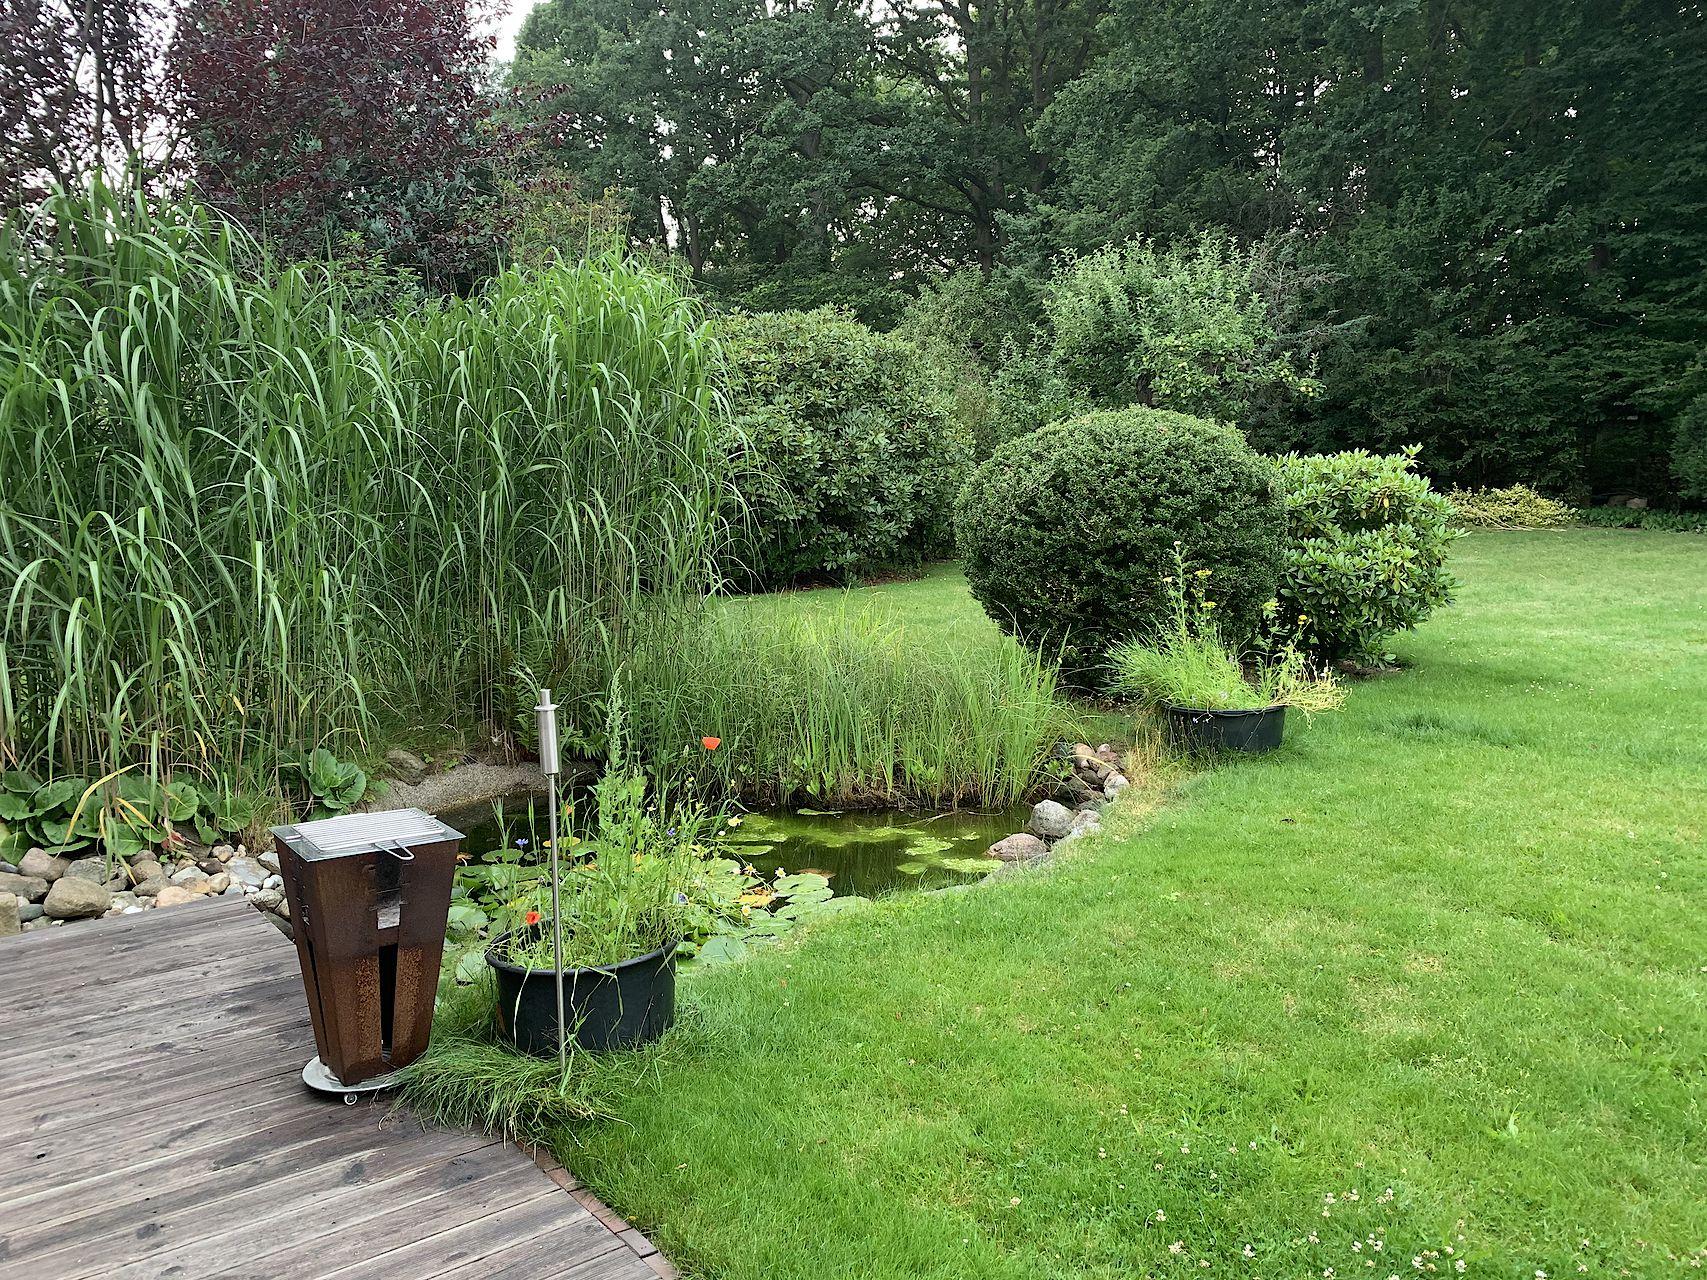 Erster Blick in den Garten